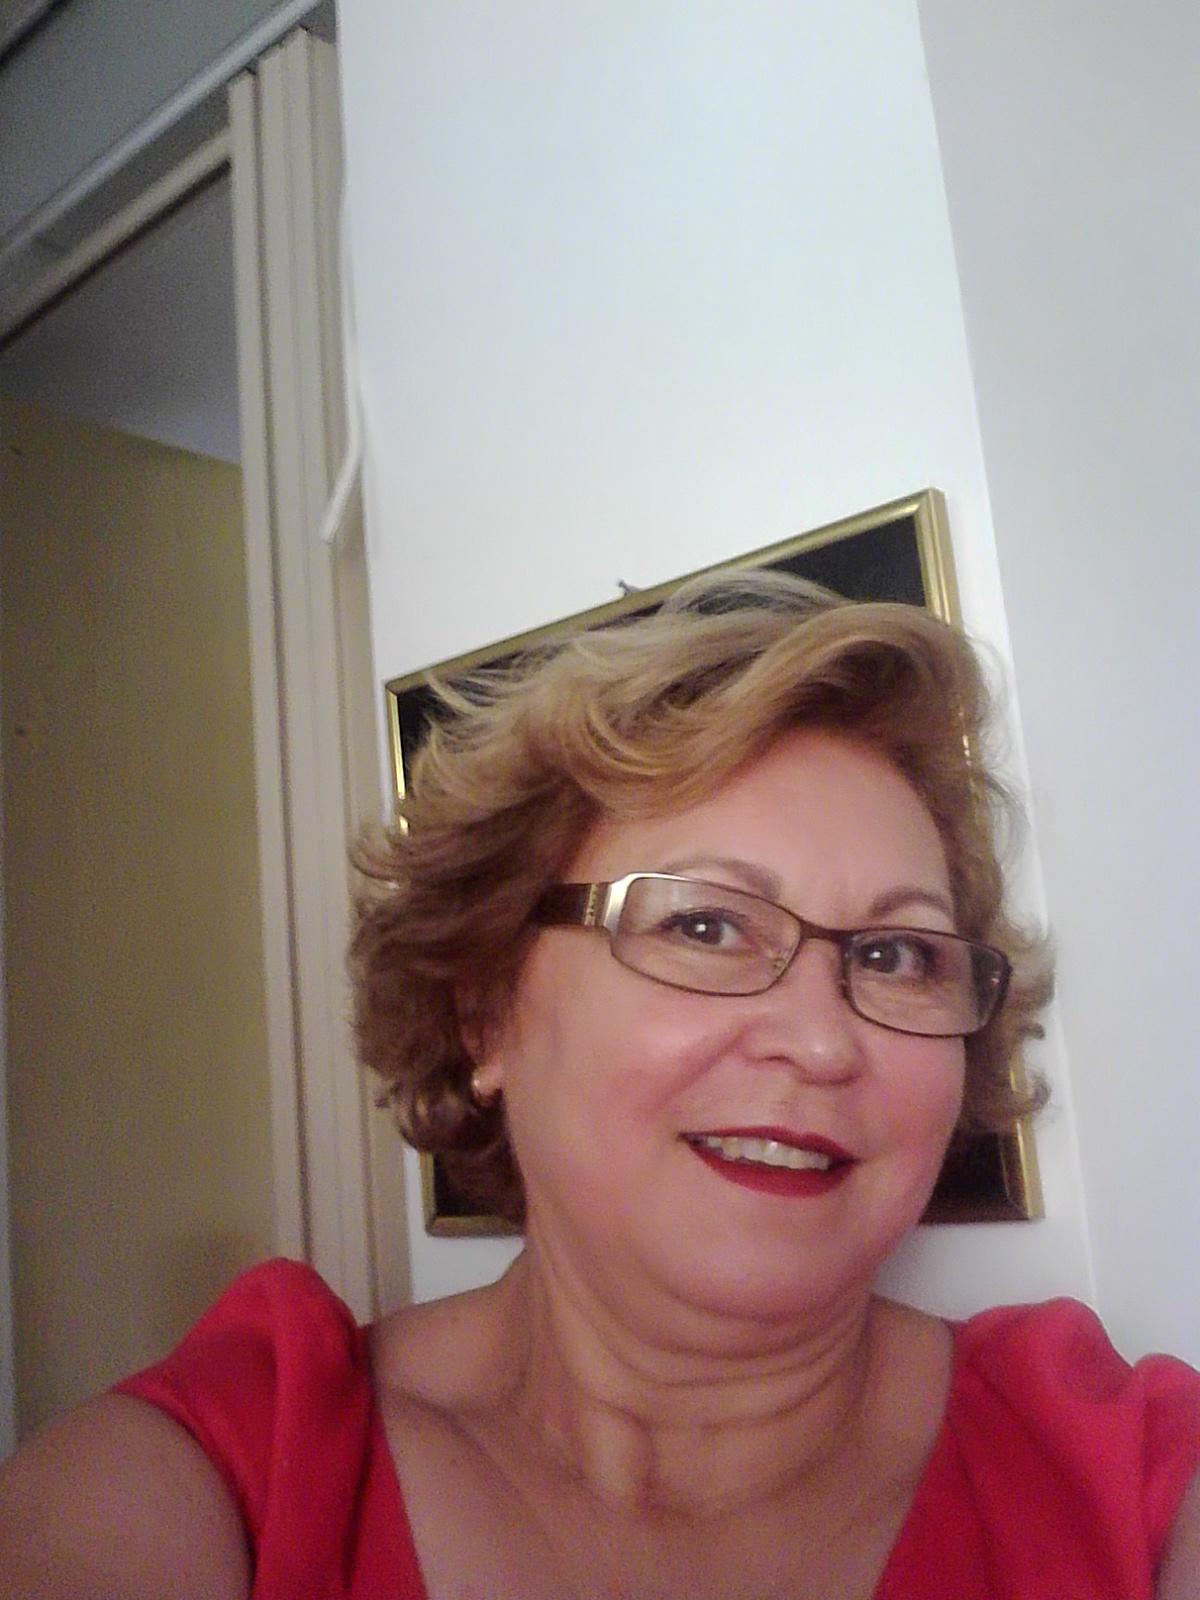 cabelo cabeleireiro(a) depilador(a)